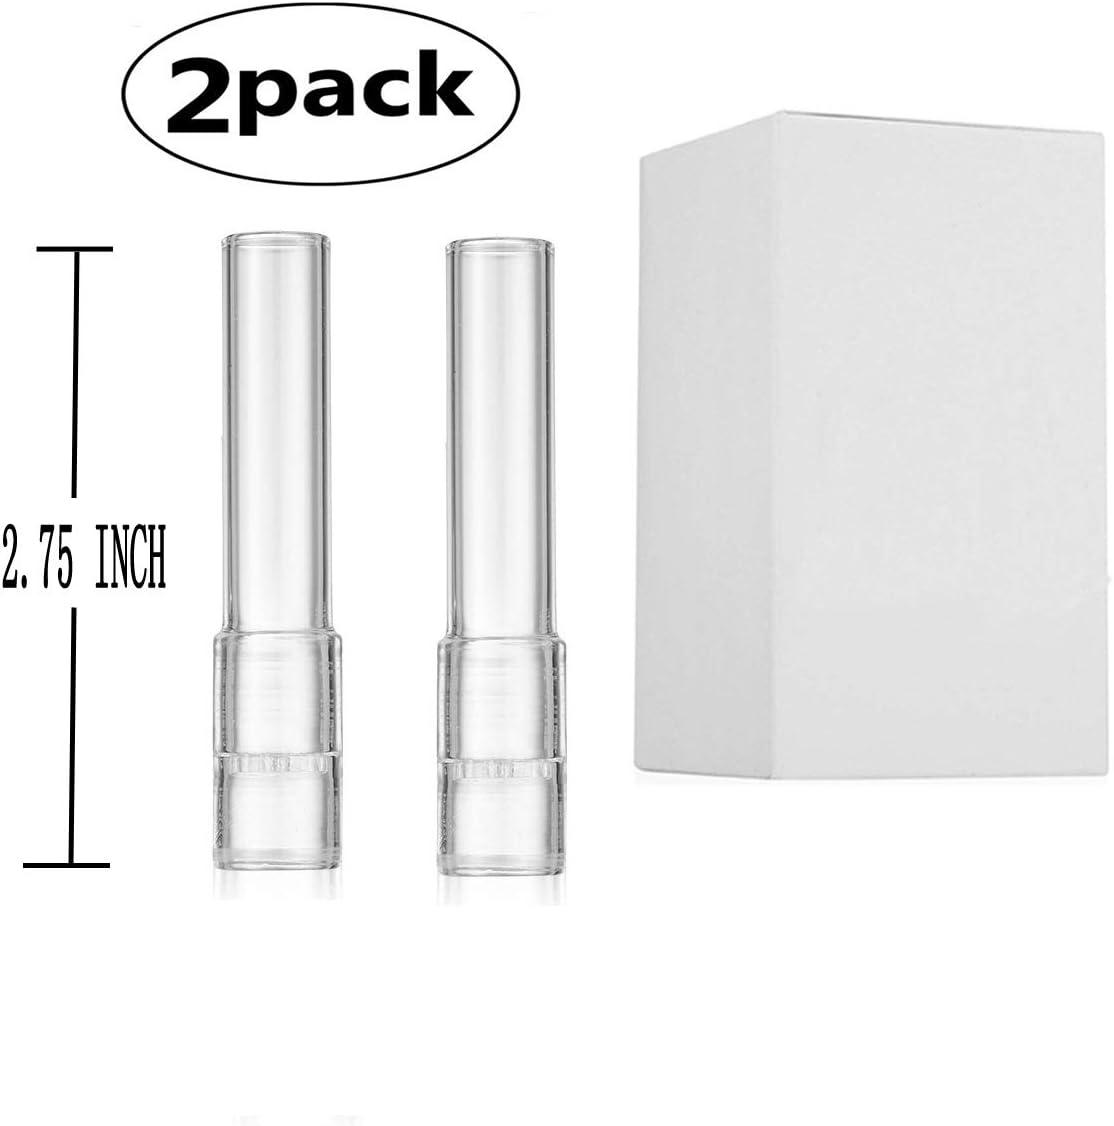 JINNUO Arizer Solo Glass Tube Stem (Recto corto) Tubo en ángulo (paquete de 2) (2 Pack)